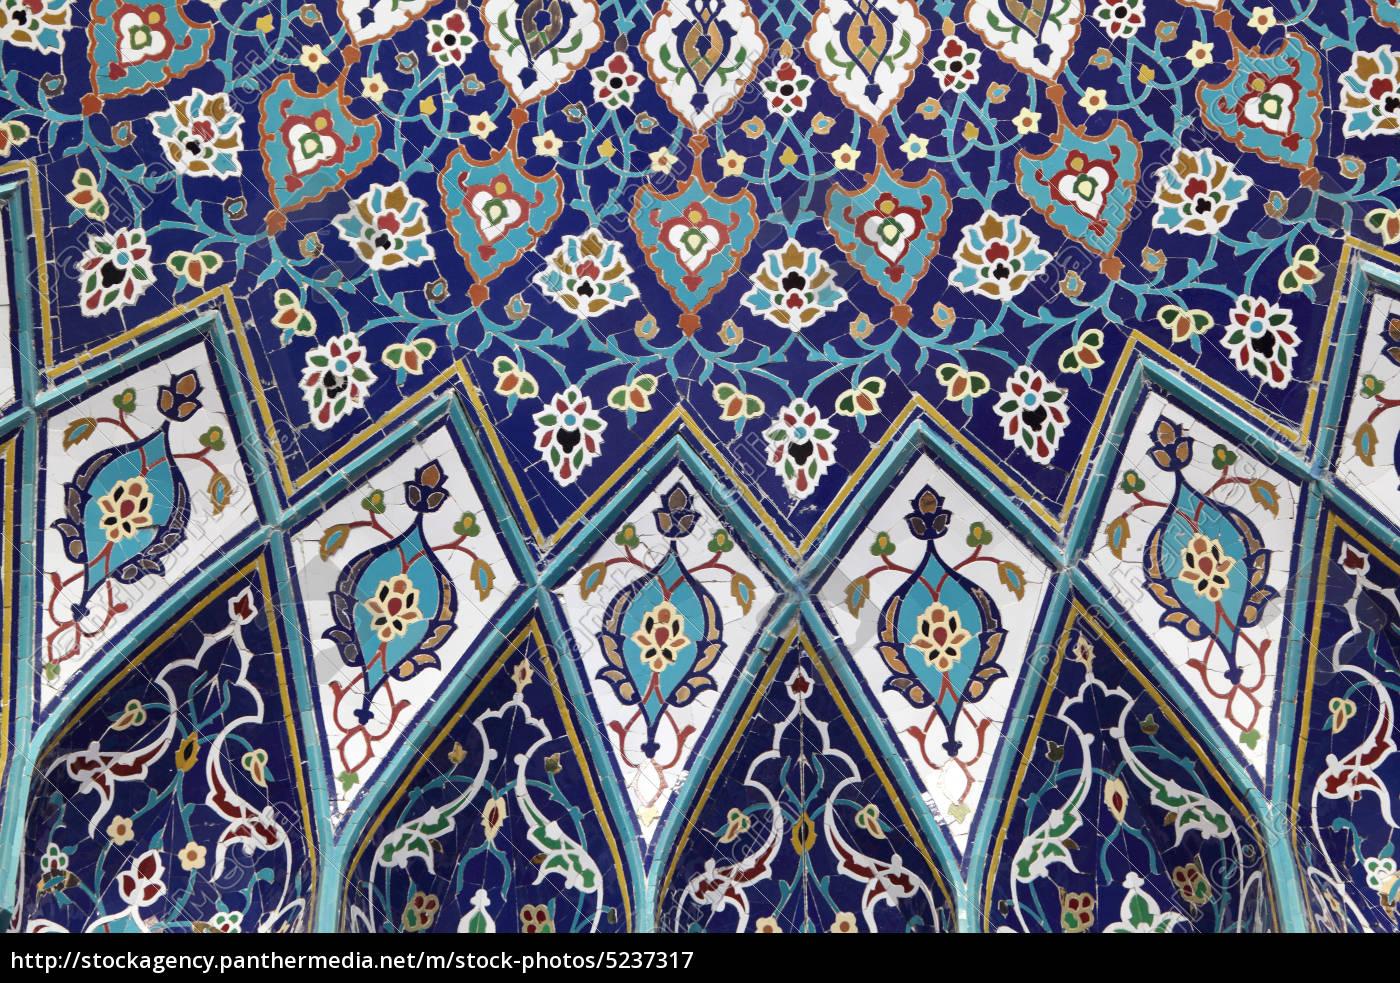 orientalische mosaik ornamente lizenzfreies bild. Black Bedroom Furniture Sets. Home Design Ideas